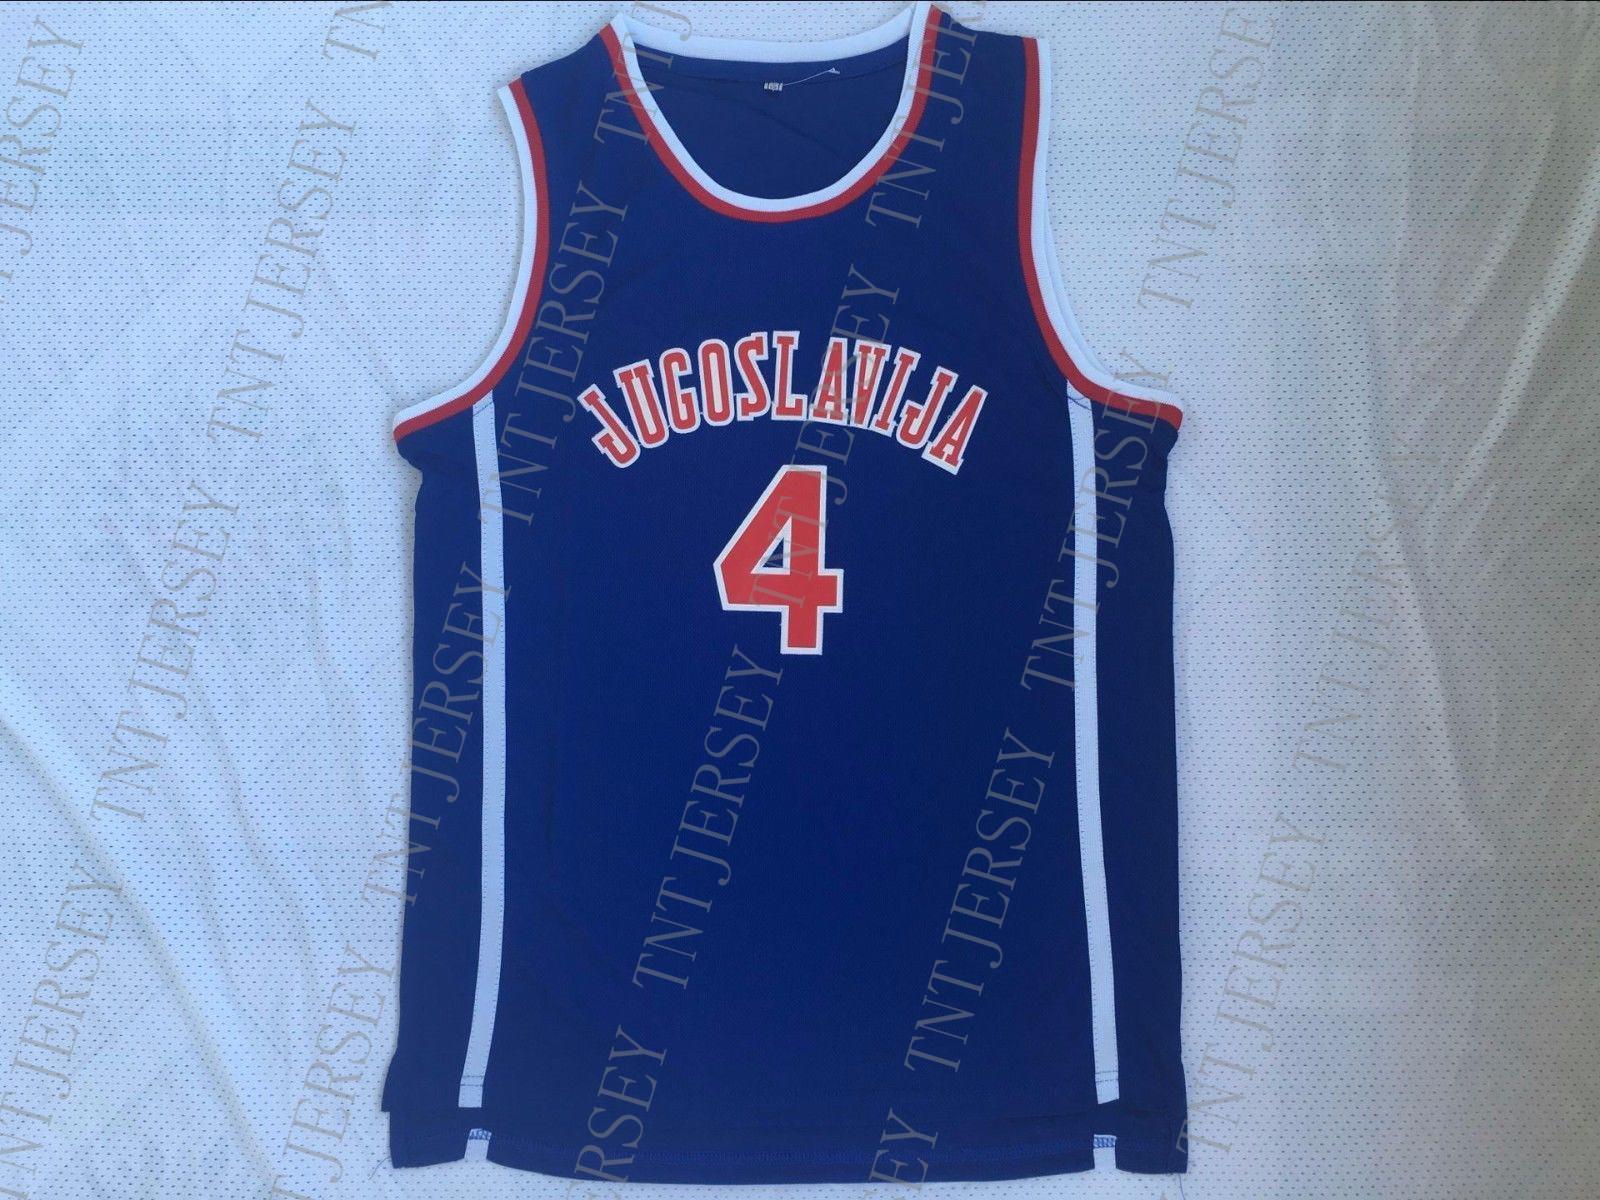 2019 Cheap Custom Drazen Petrovic  4 Jugoslavija Yugoslavia Croatia  Basketball Jersey Stitched Customize Any Number Name MEN WOMEN YOUTH XS 5XL  From ... 2947e5068